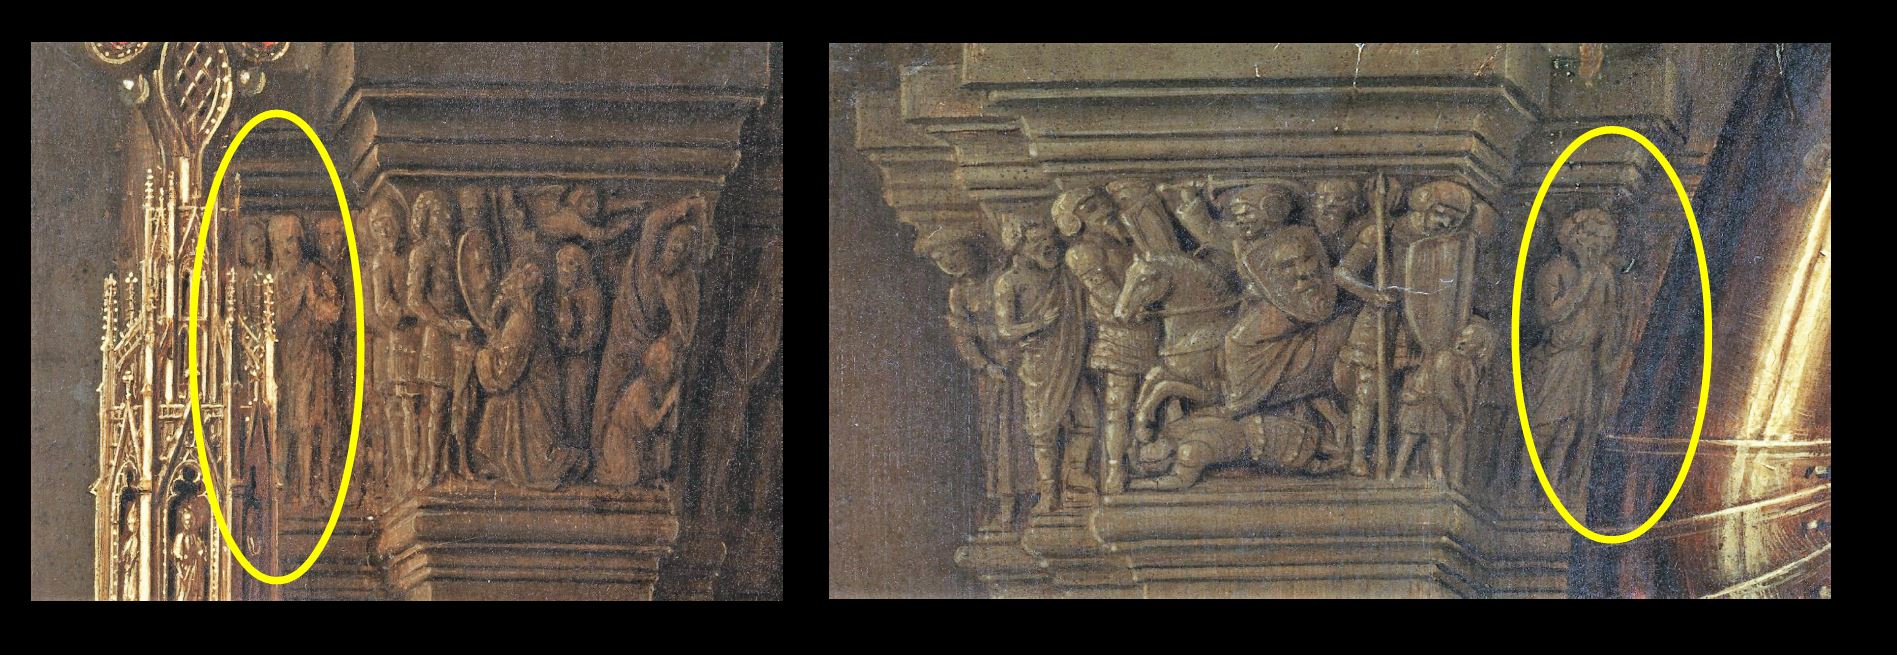 1434-36 Van Eyck La_Madone_au_Chanoine_Van_der_Paele Groeningemuseum, Bruges schema continuite